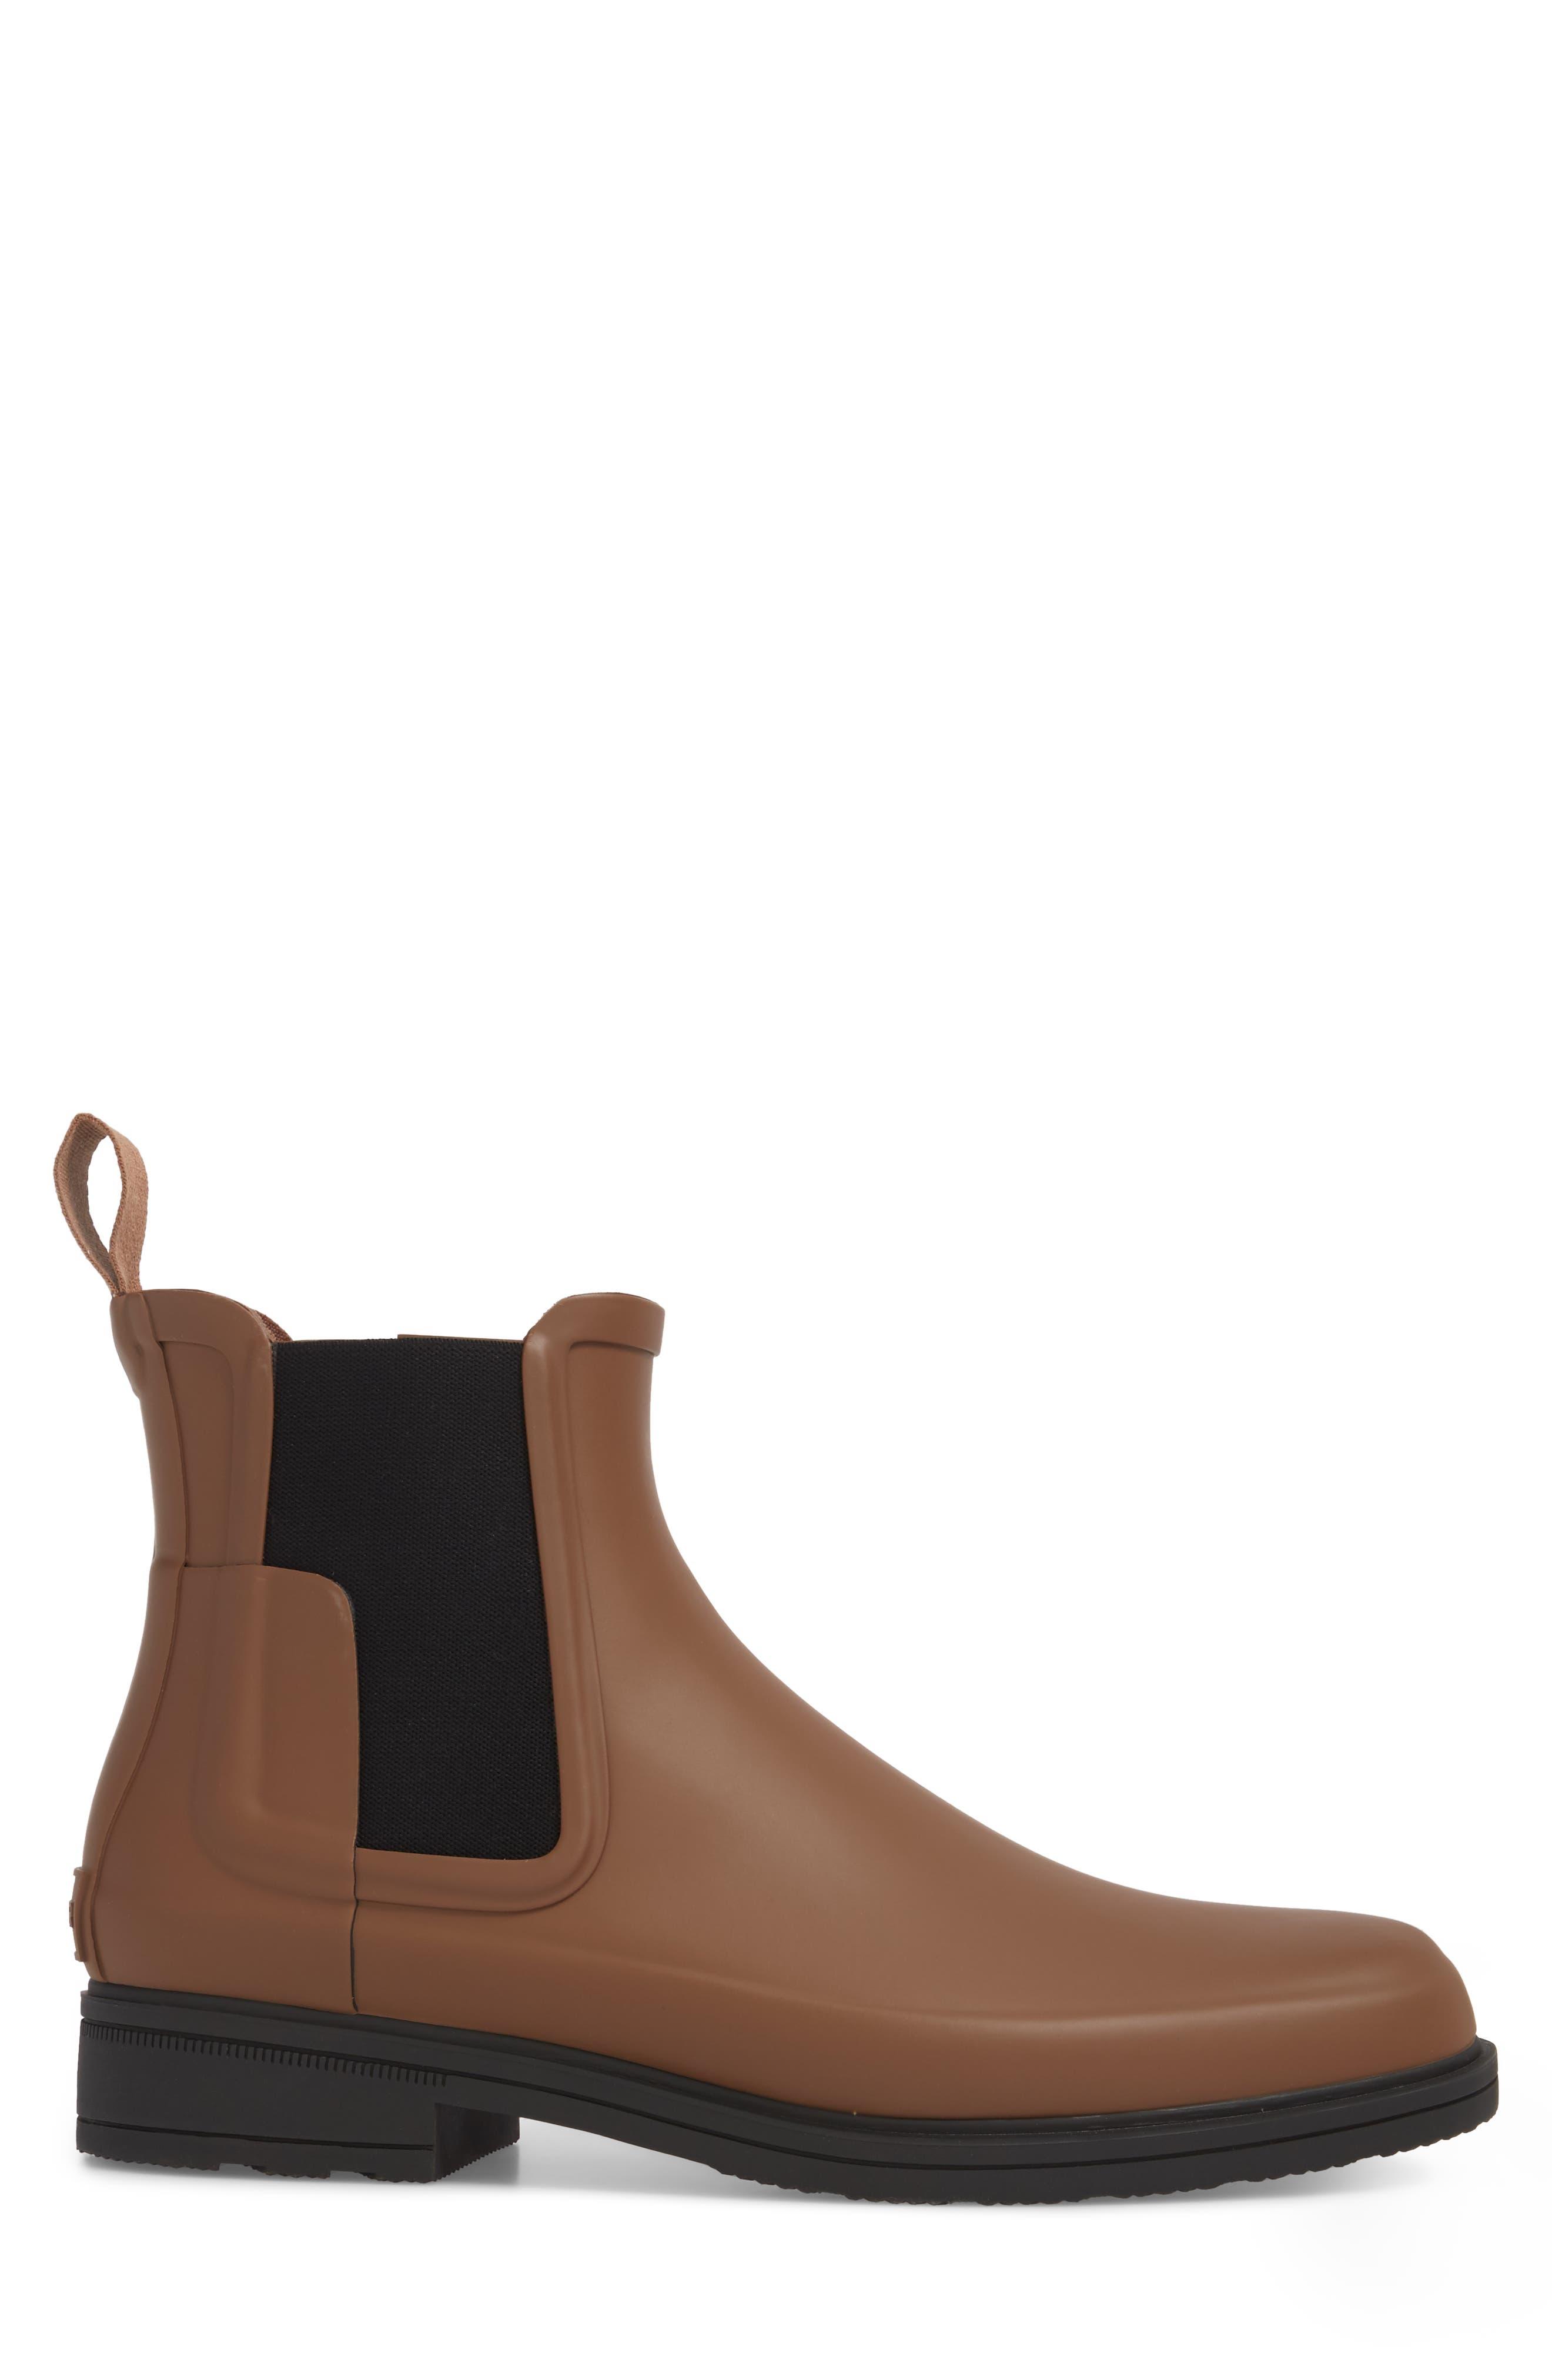 Alternate Image 3  - Hunter Original Refined Waterproof Chelsea Boot (Men)